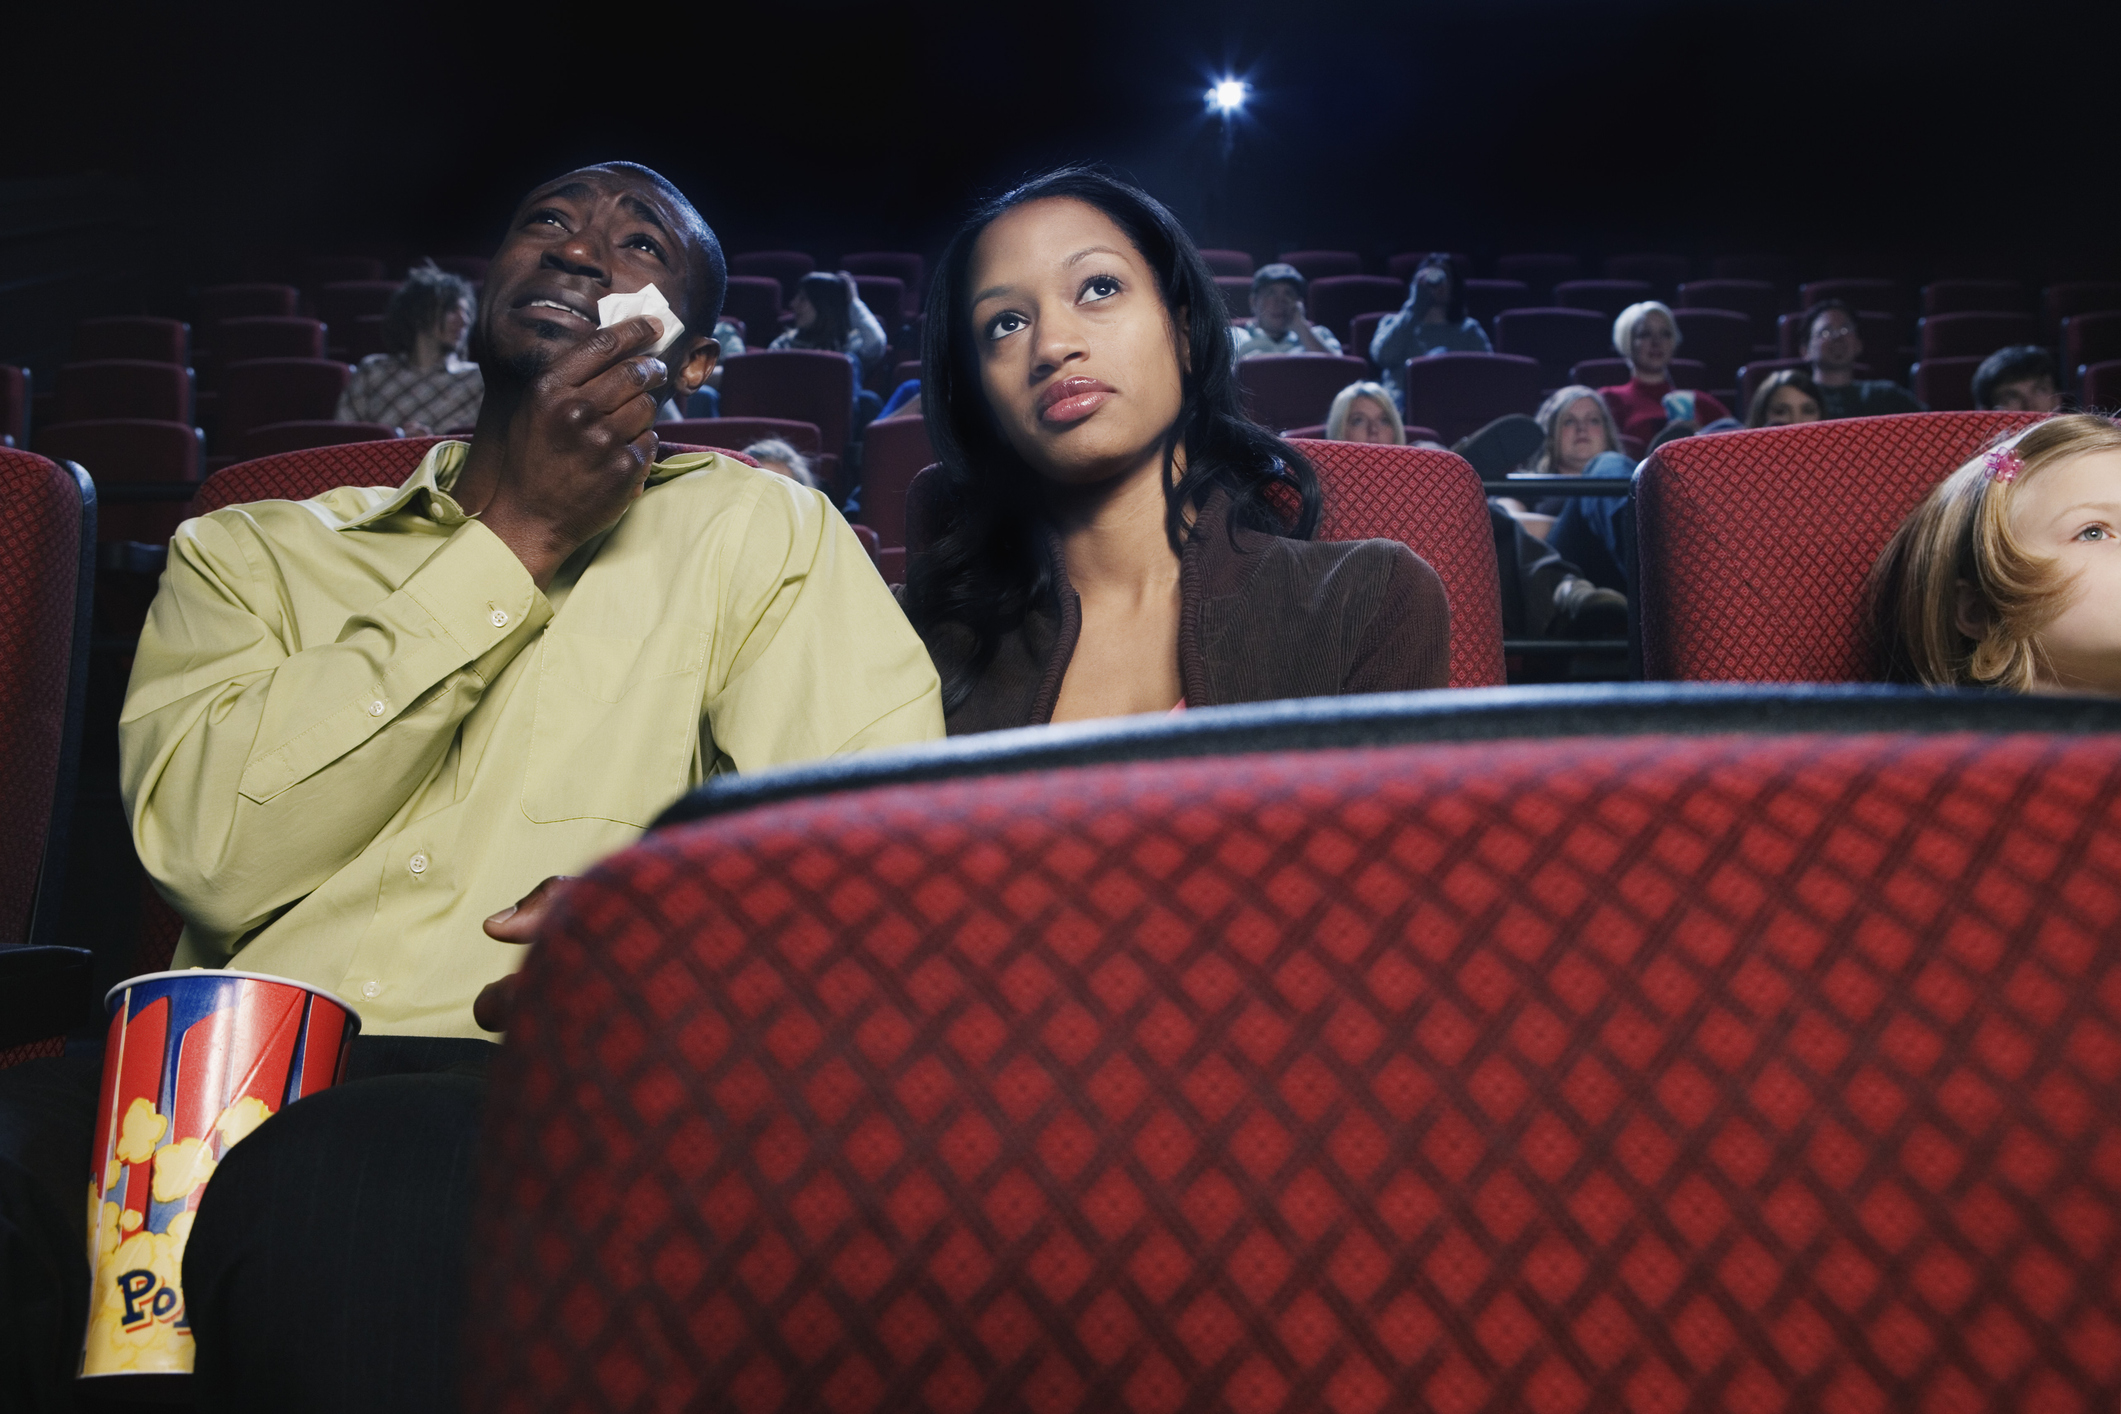 Couple Watching a Sad Movie